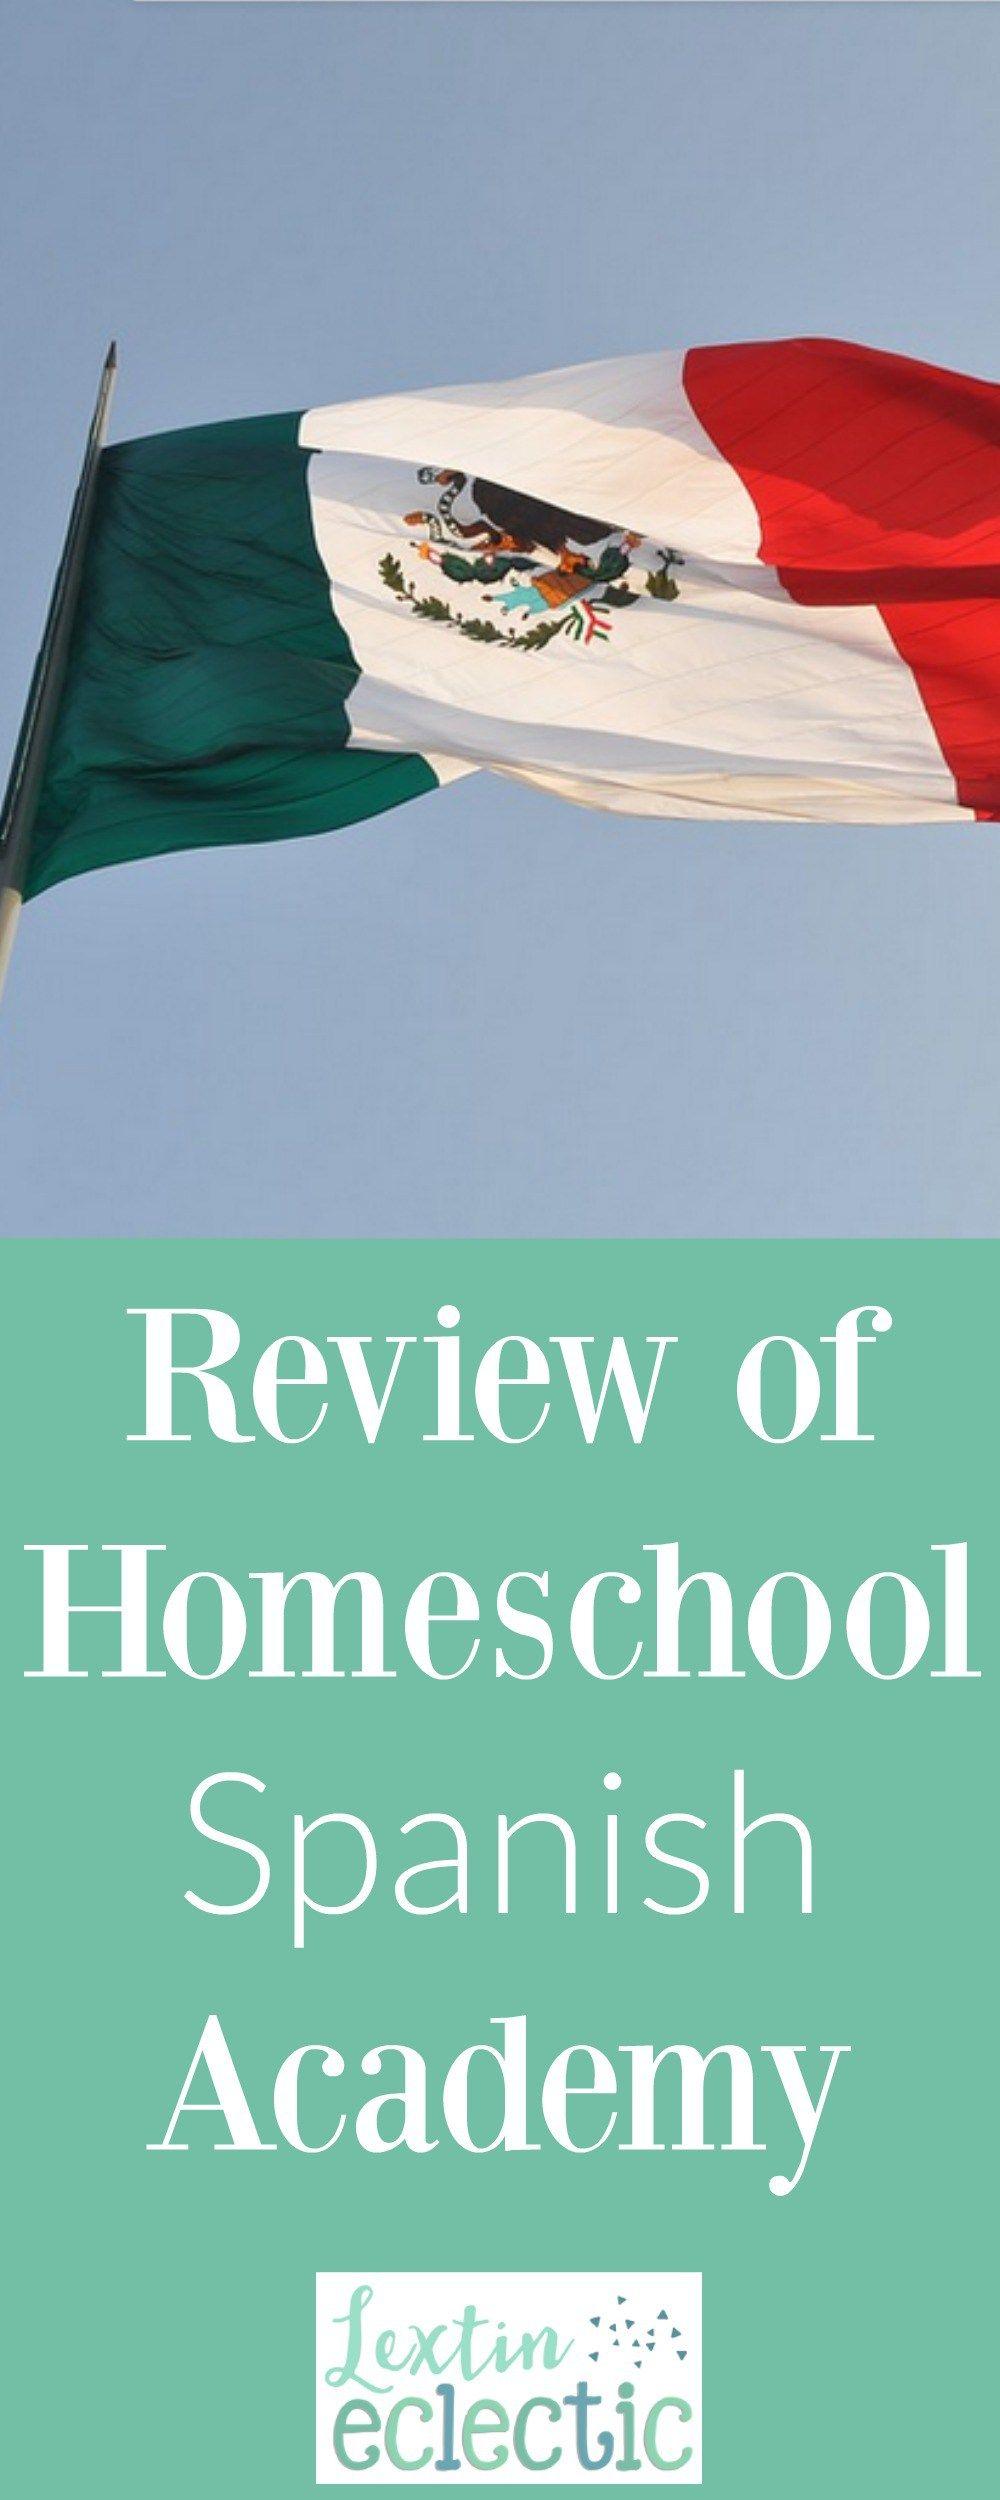 A review of homeschool spanish academy homeschool